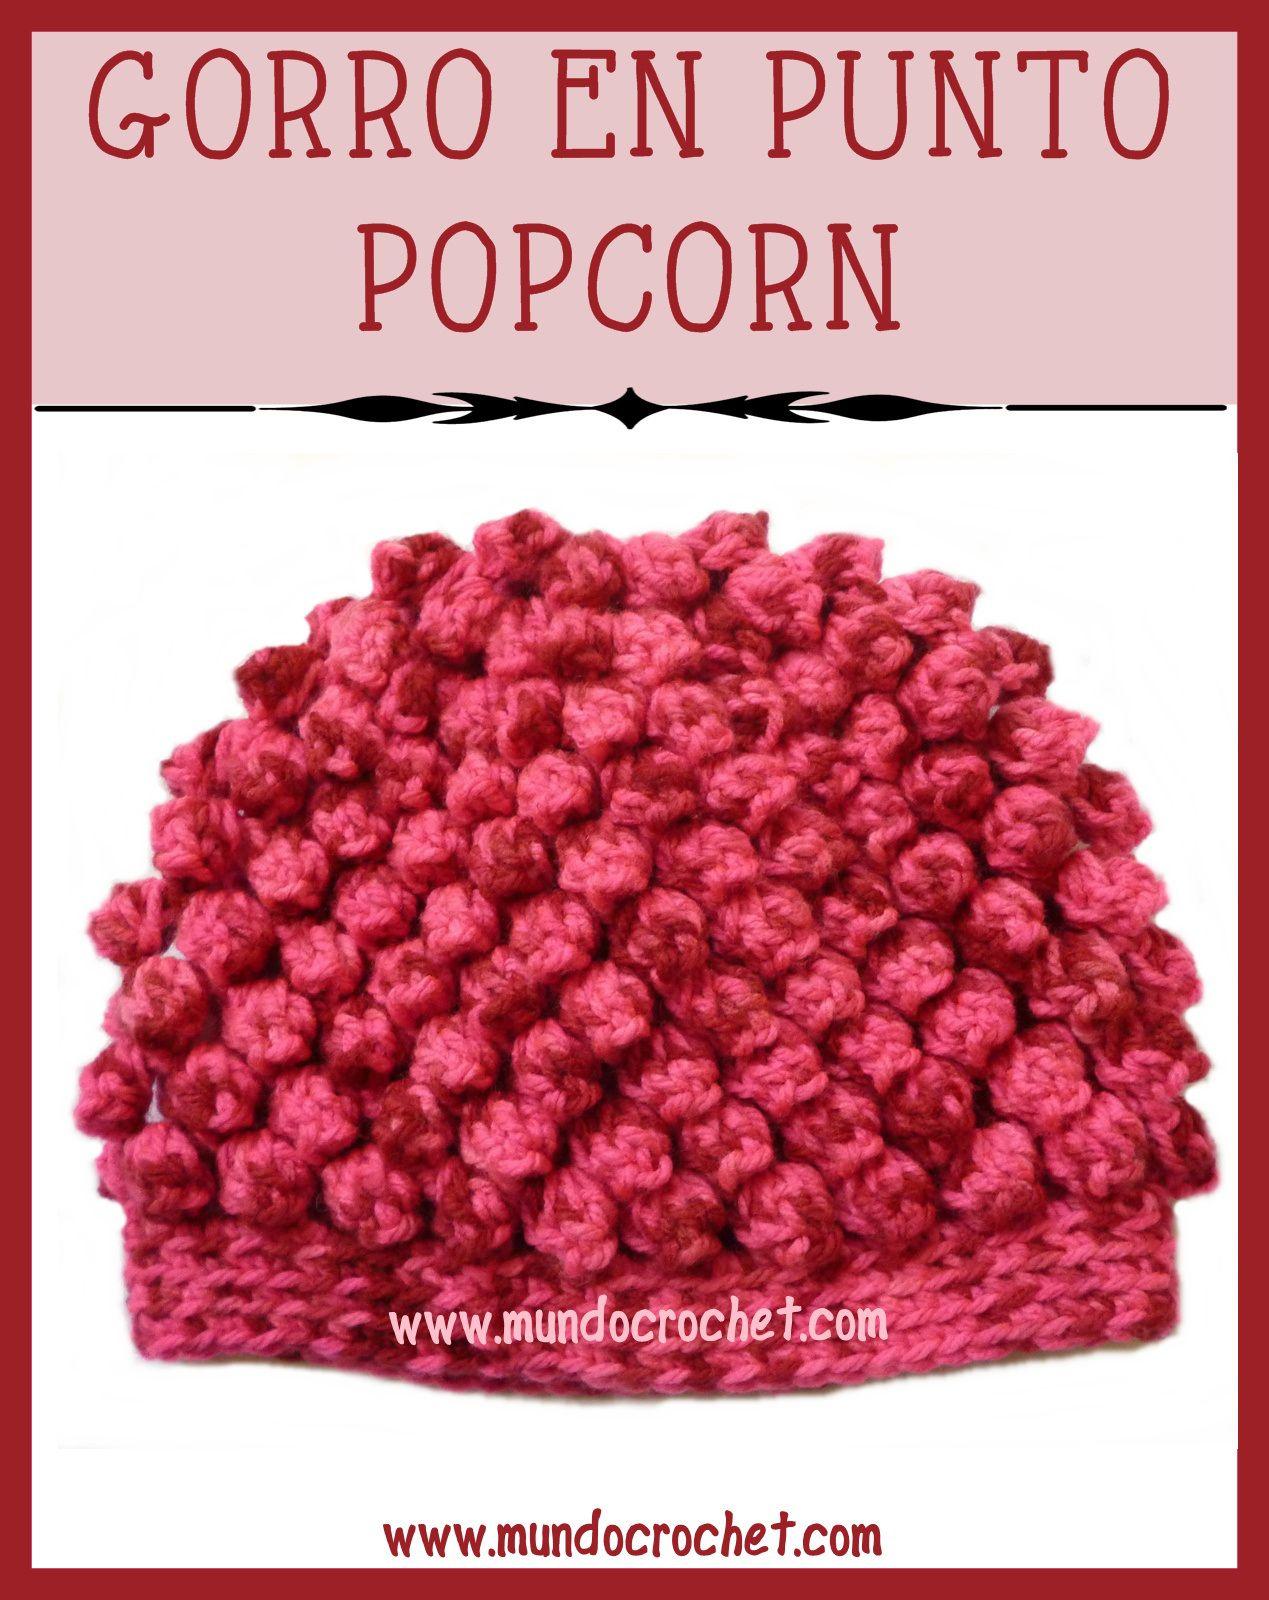 Gorro en punto popcorn crochet o ganchillo | Kids Crochet - Hats ...